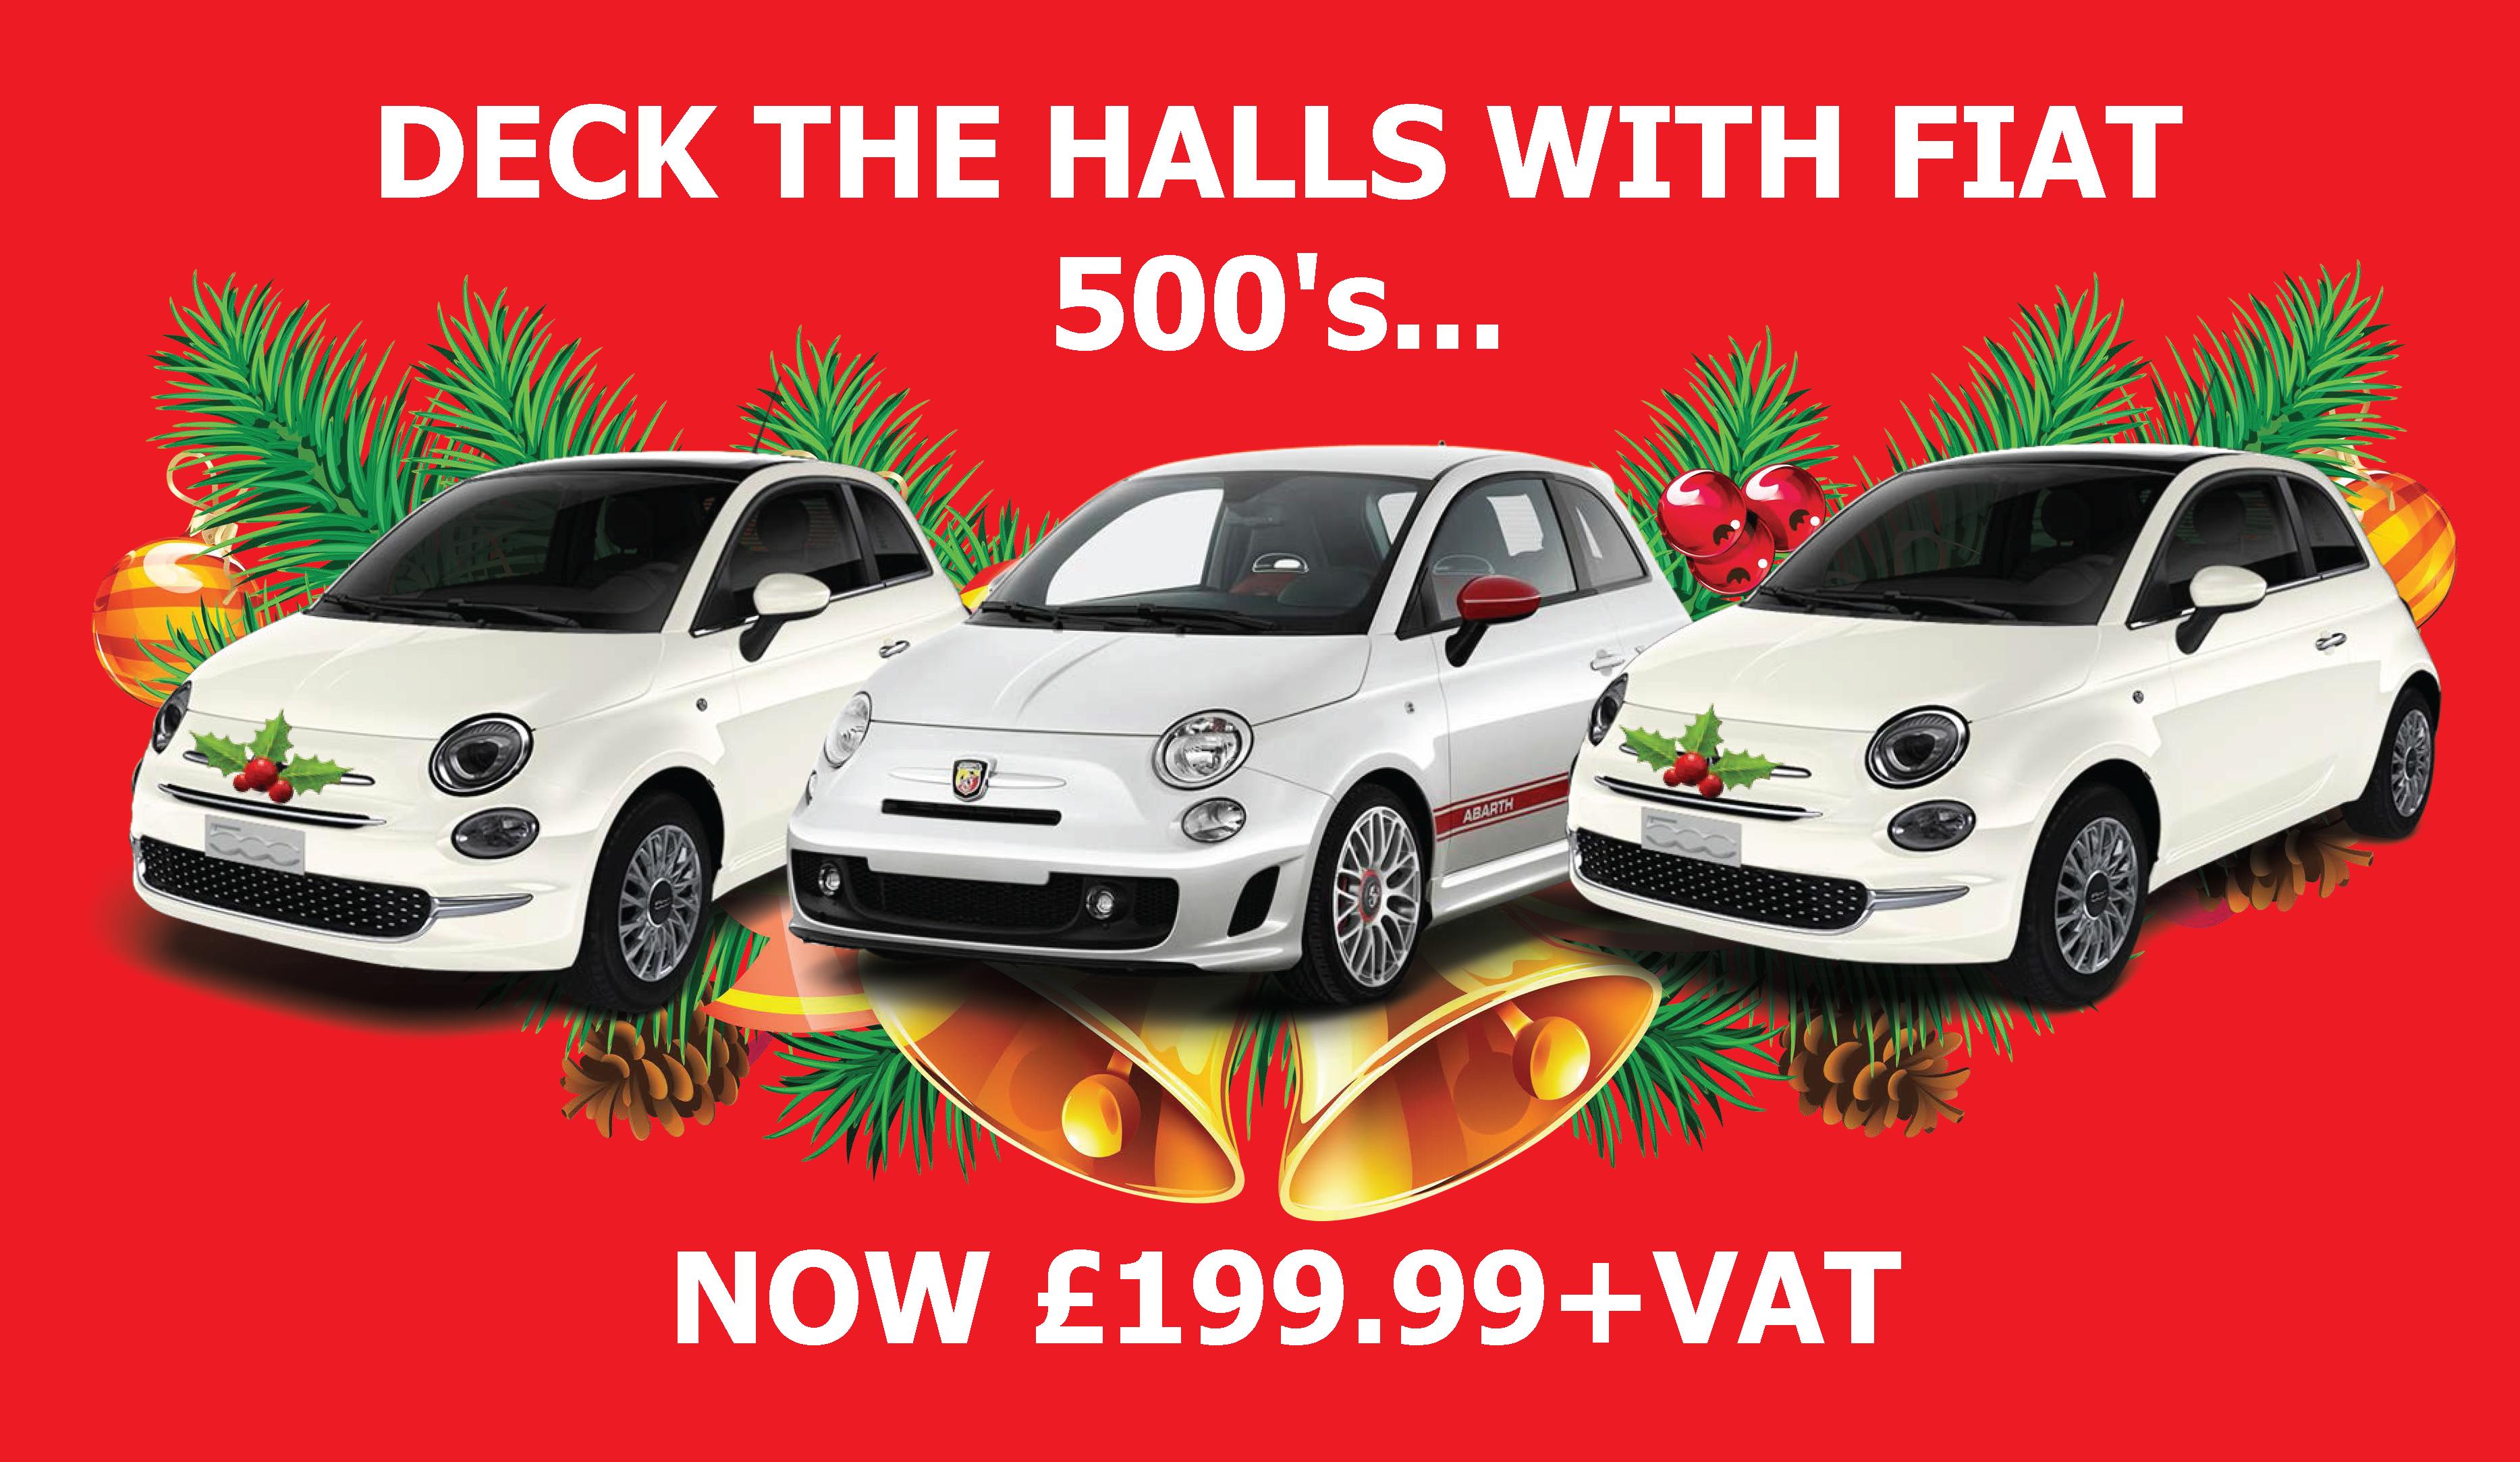 Fiat-500-Deck-The-Halls